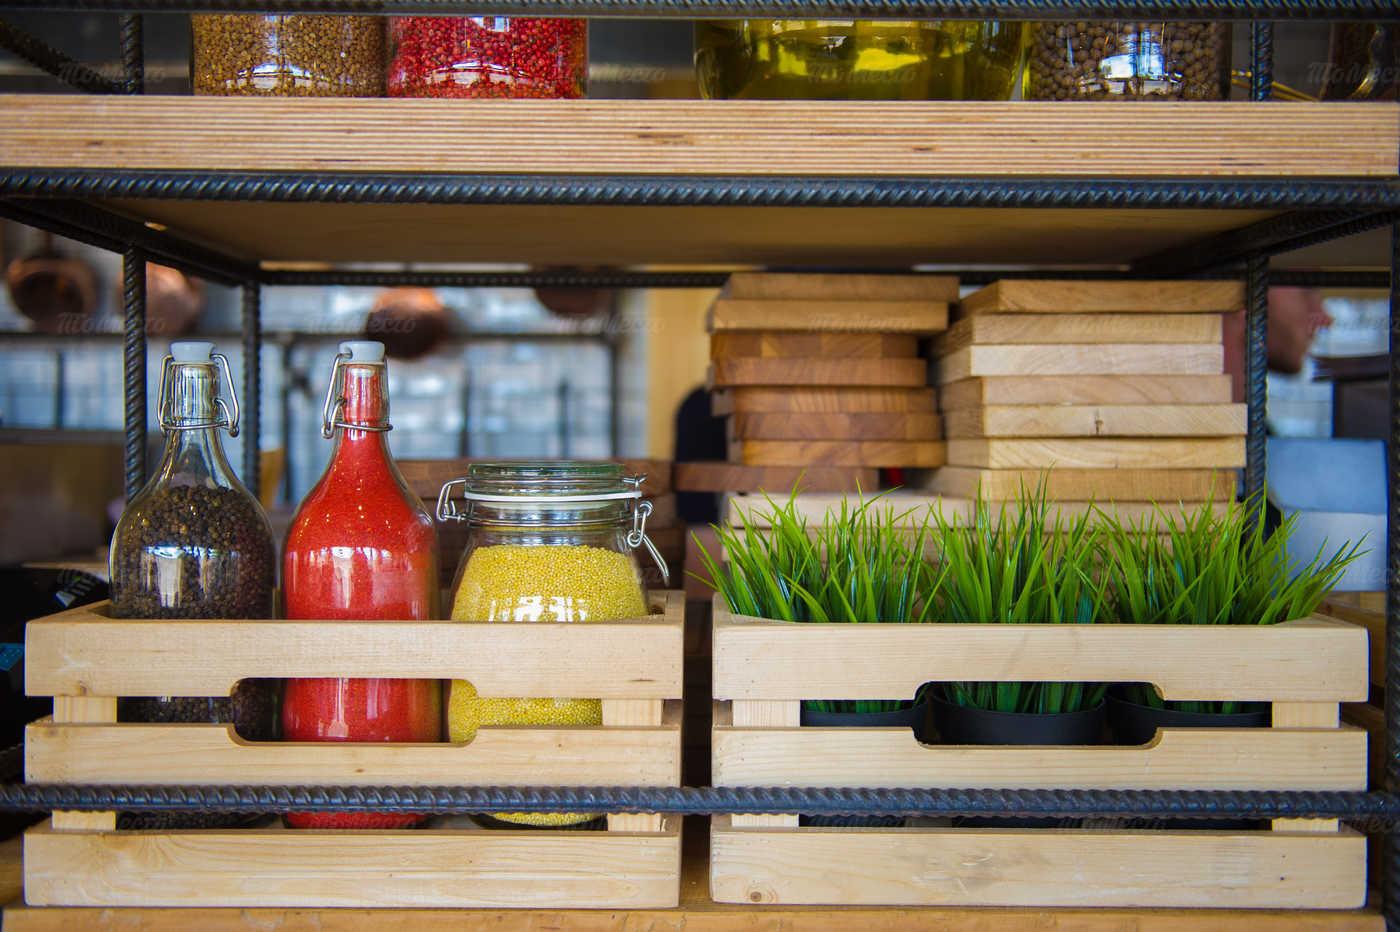 Банкеты ресторана FOOD BAZAR (Фуд базар) на улице Каретный Ряд фото 11